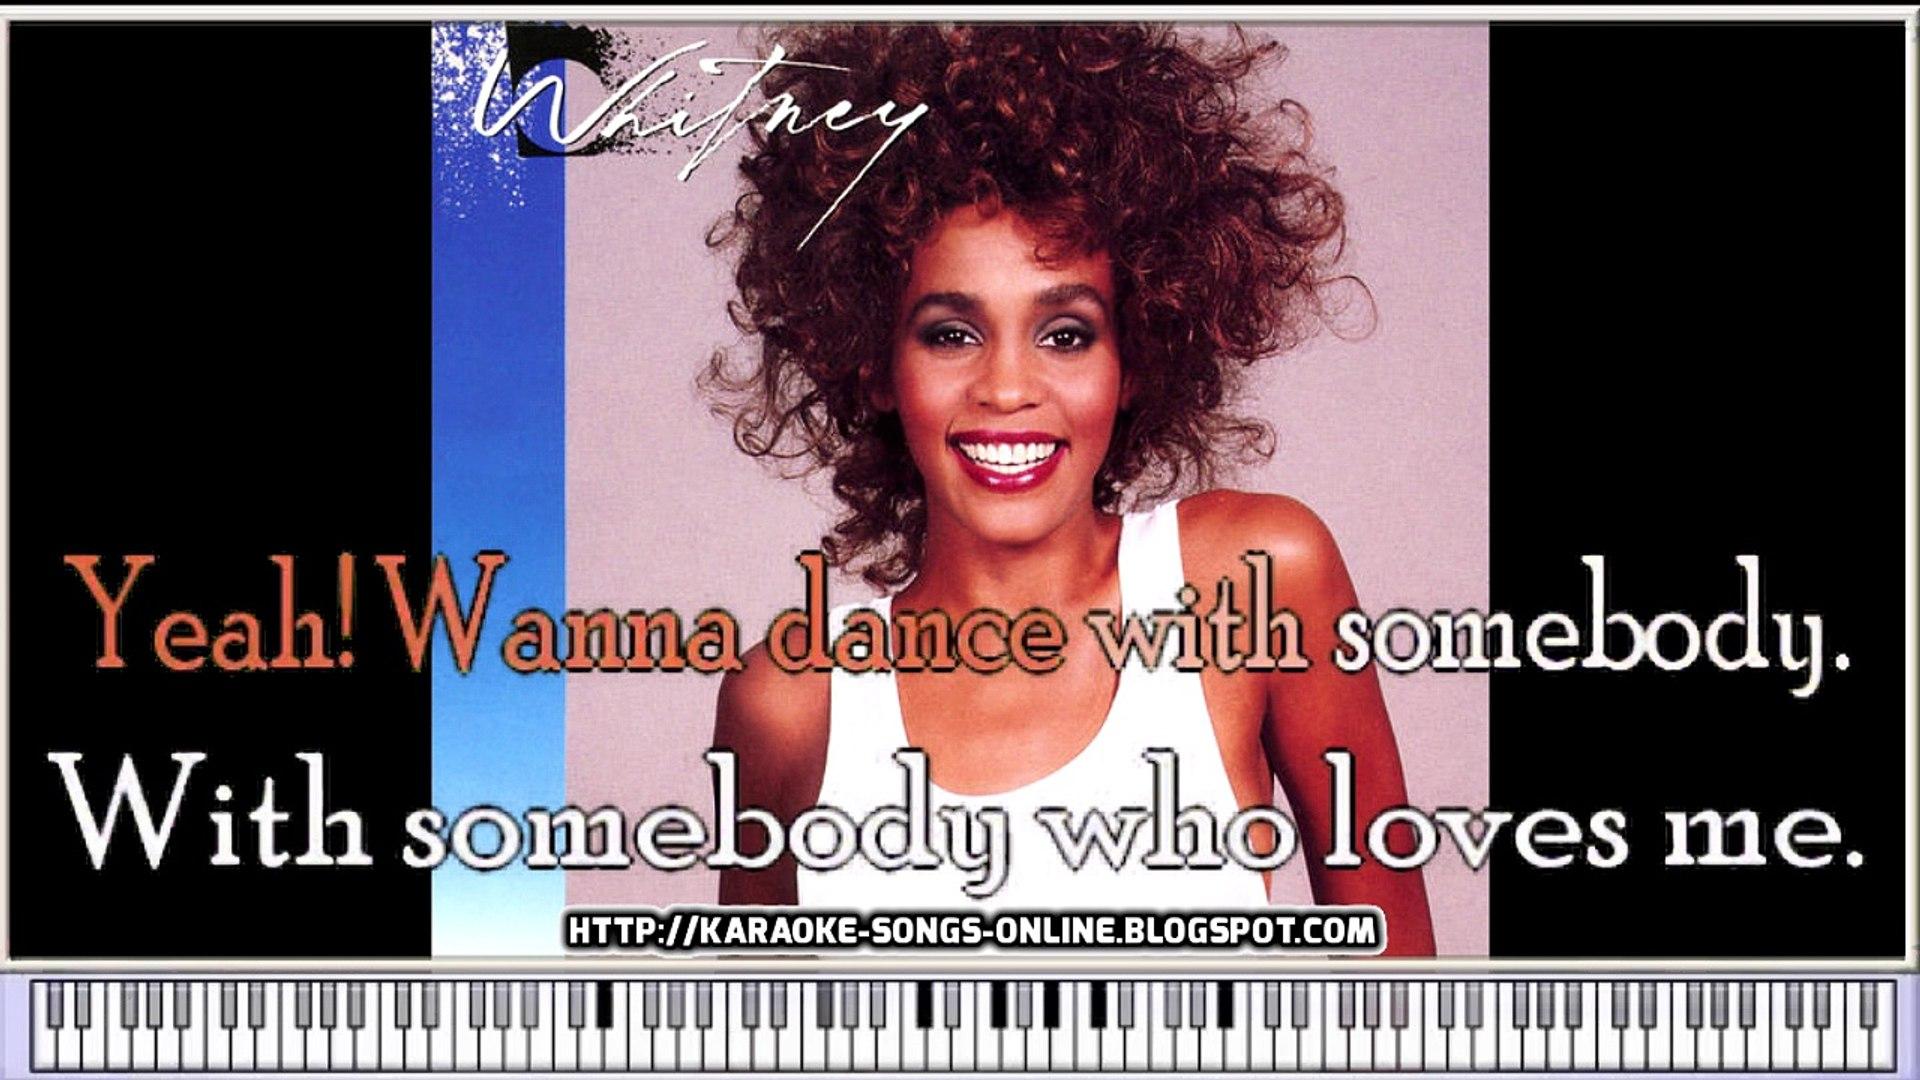 Whitney Houston -I Wanna Dance With Somebody - Karaoke instrumetal version  with lirycs